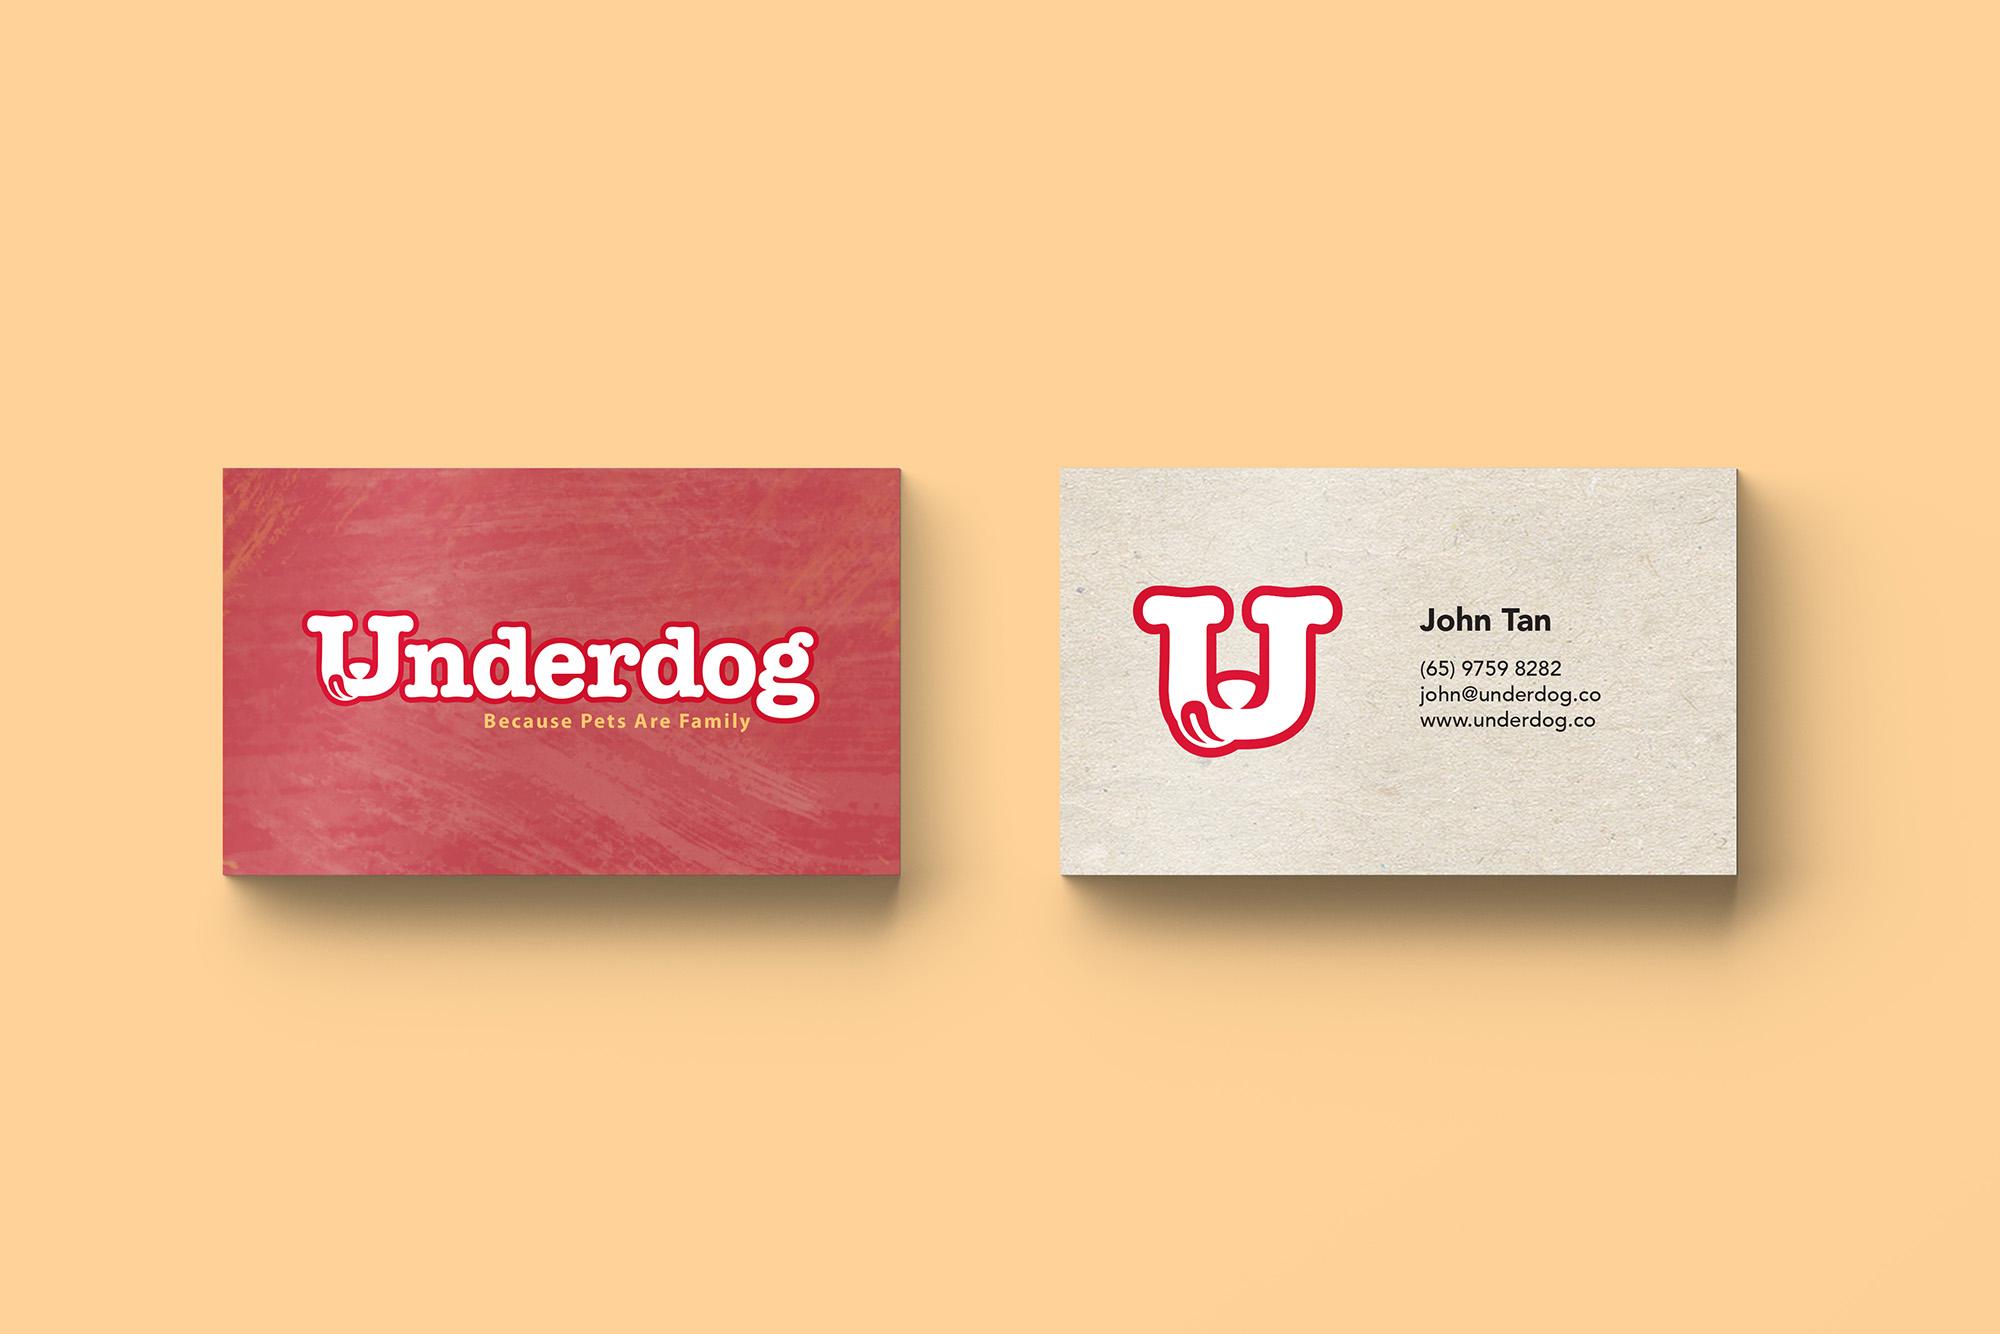 underdog namecard mockup.jpg